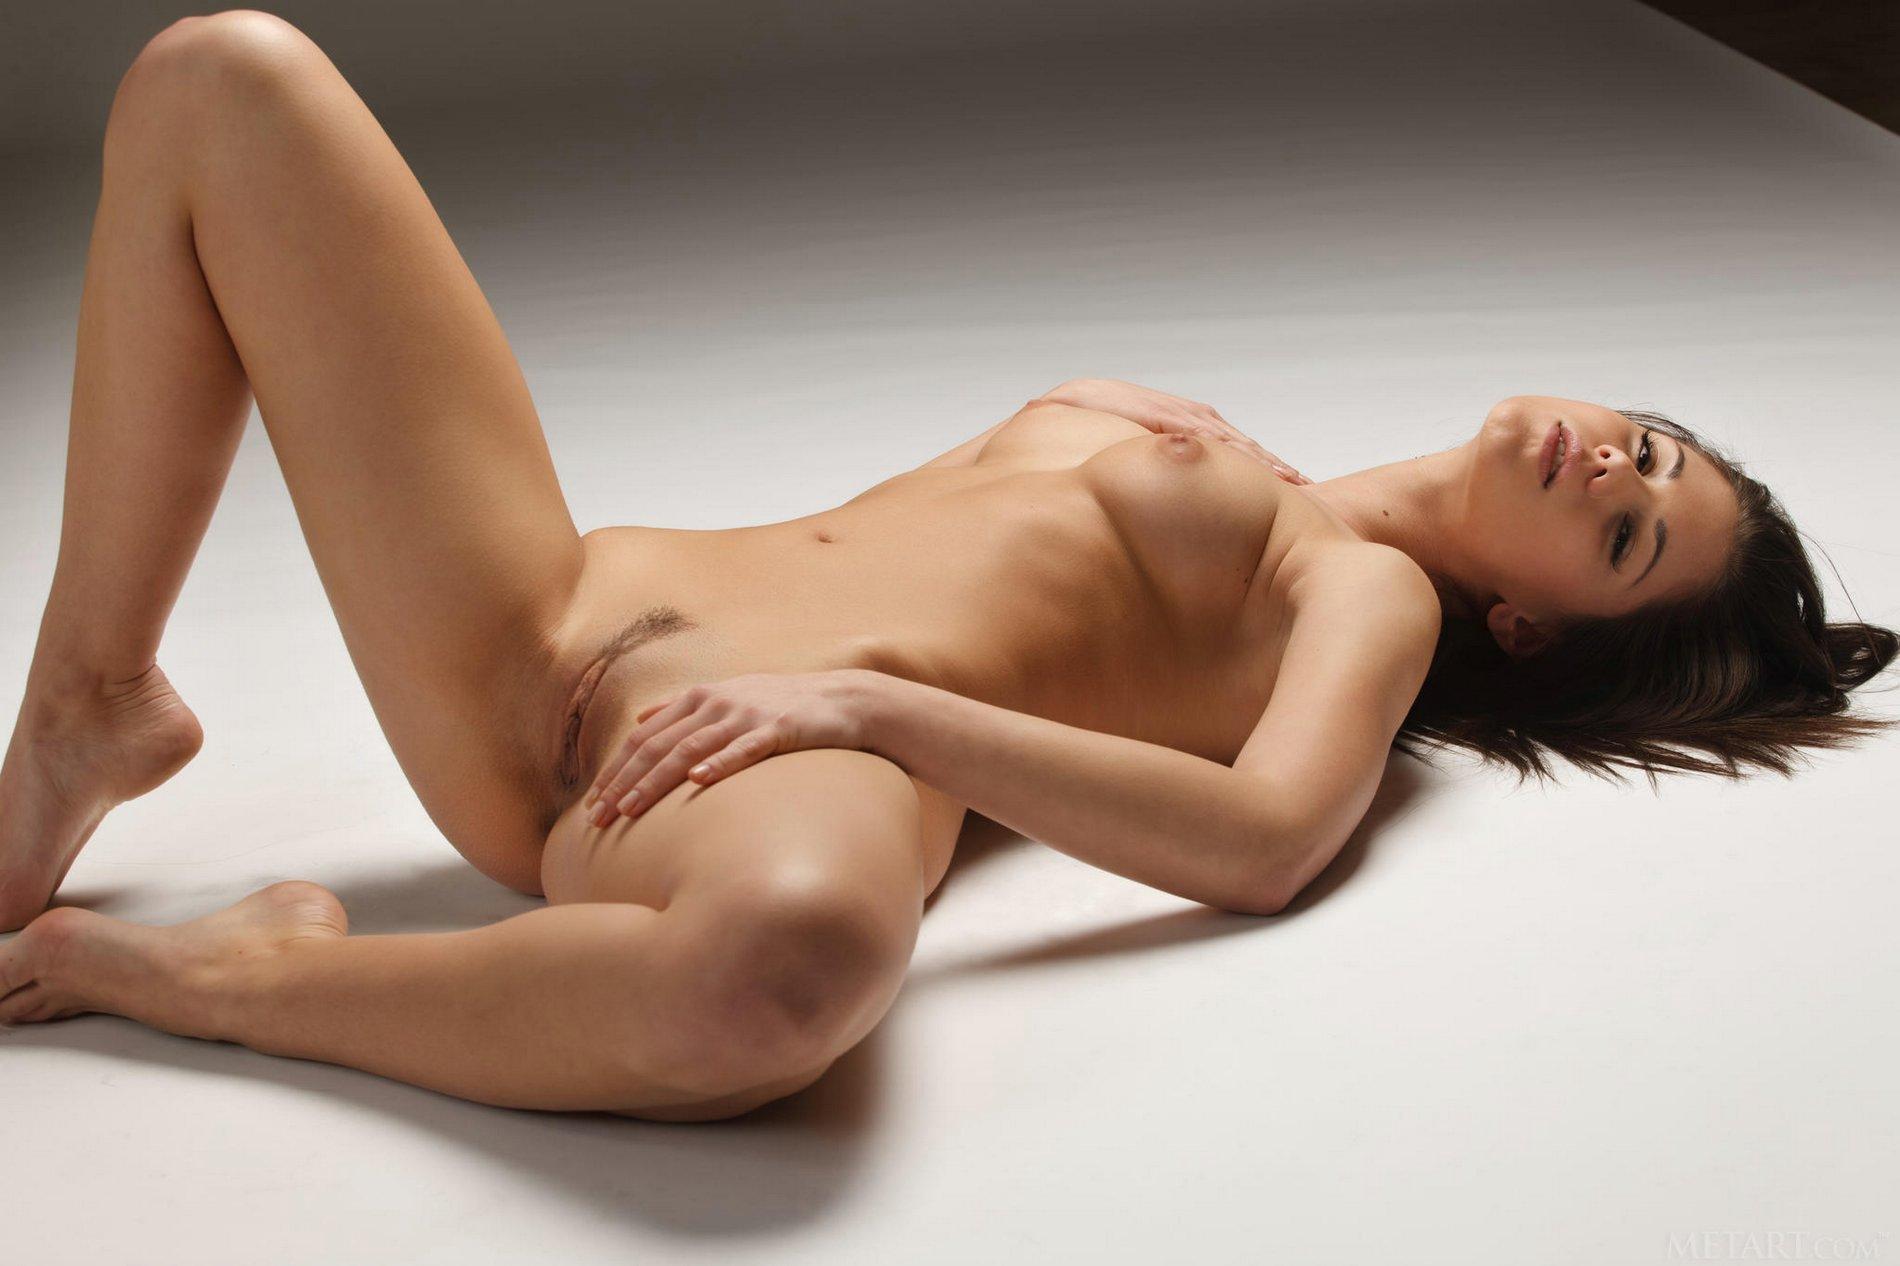 Pin on erotica